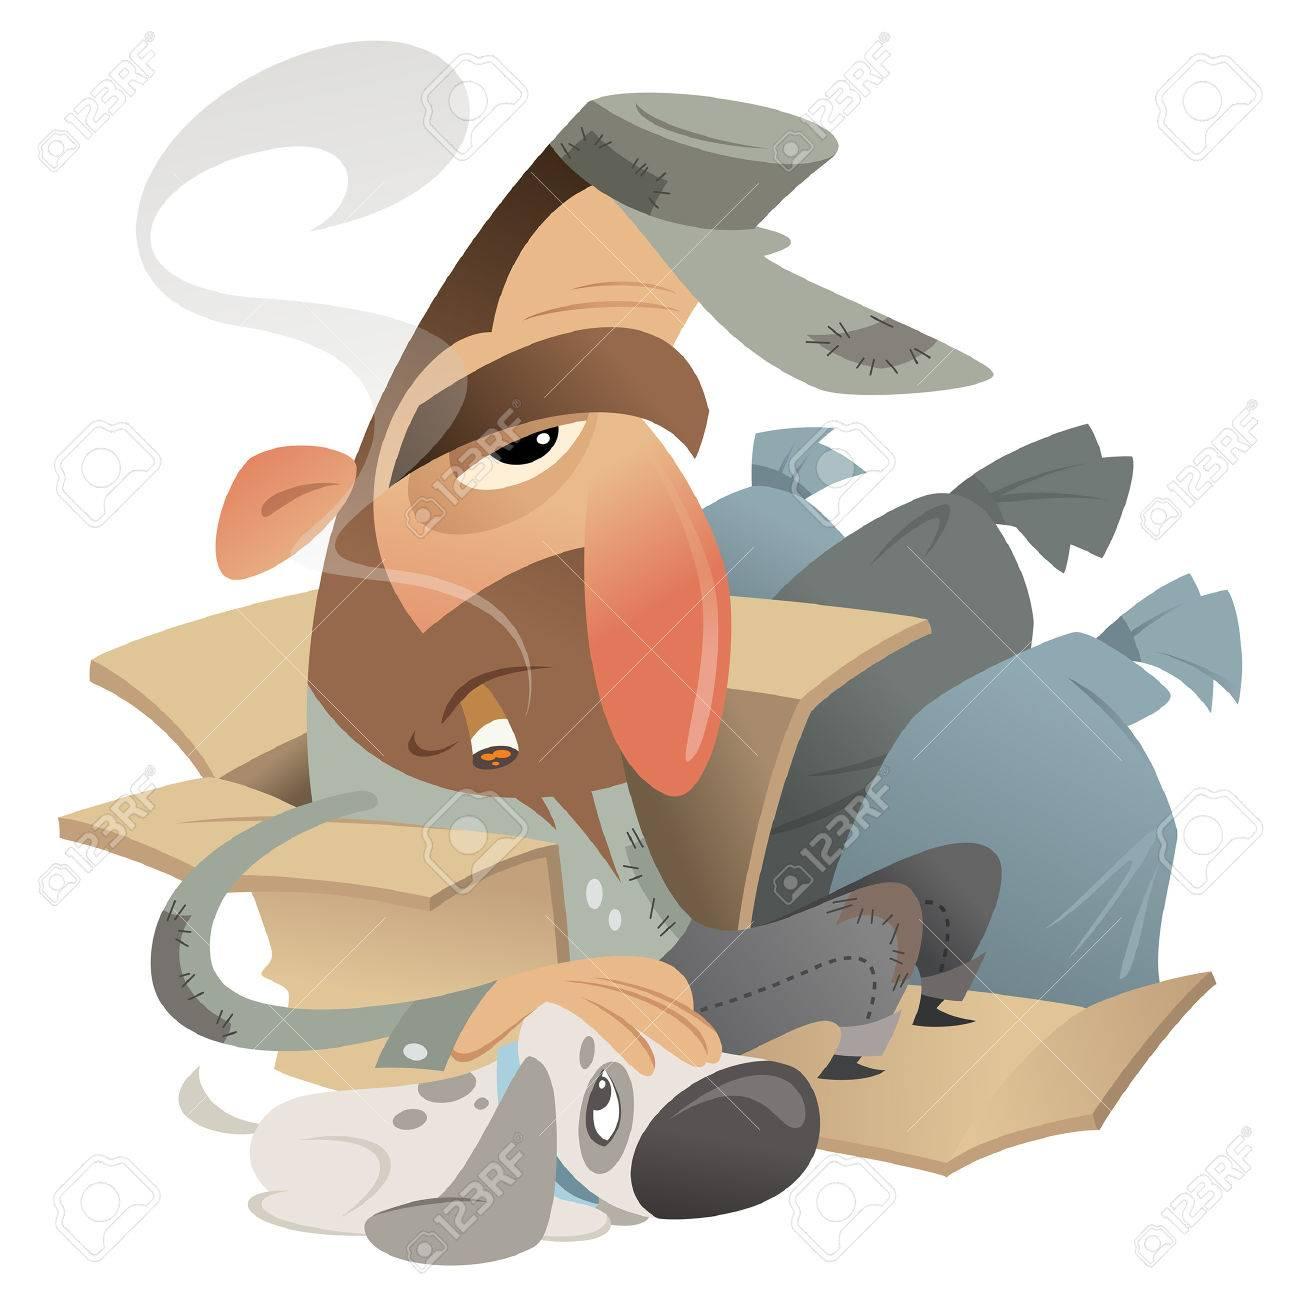 Cartoon homeless man with his dog friend sitting in a carton near trash bags - 26081498